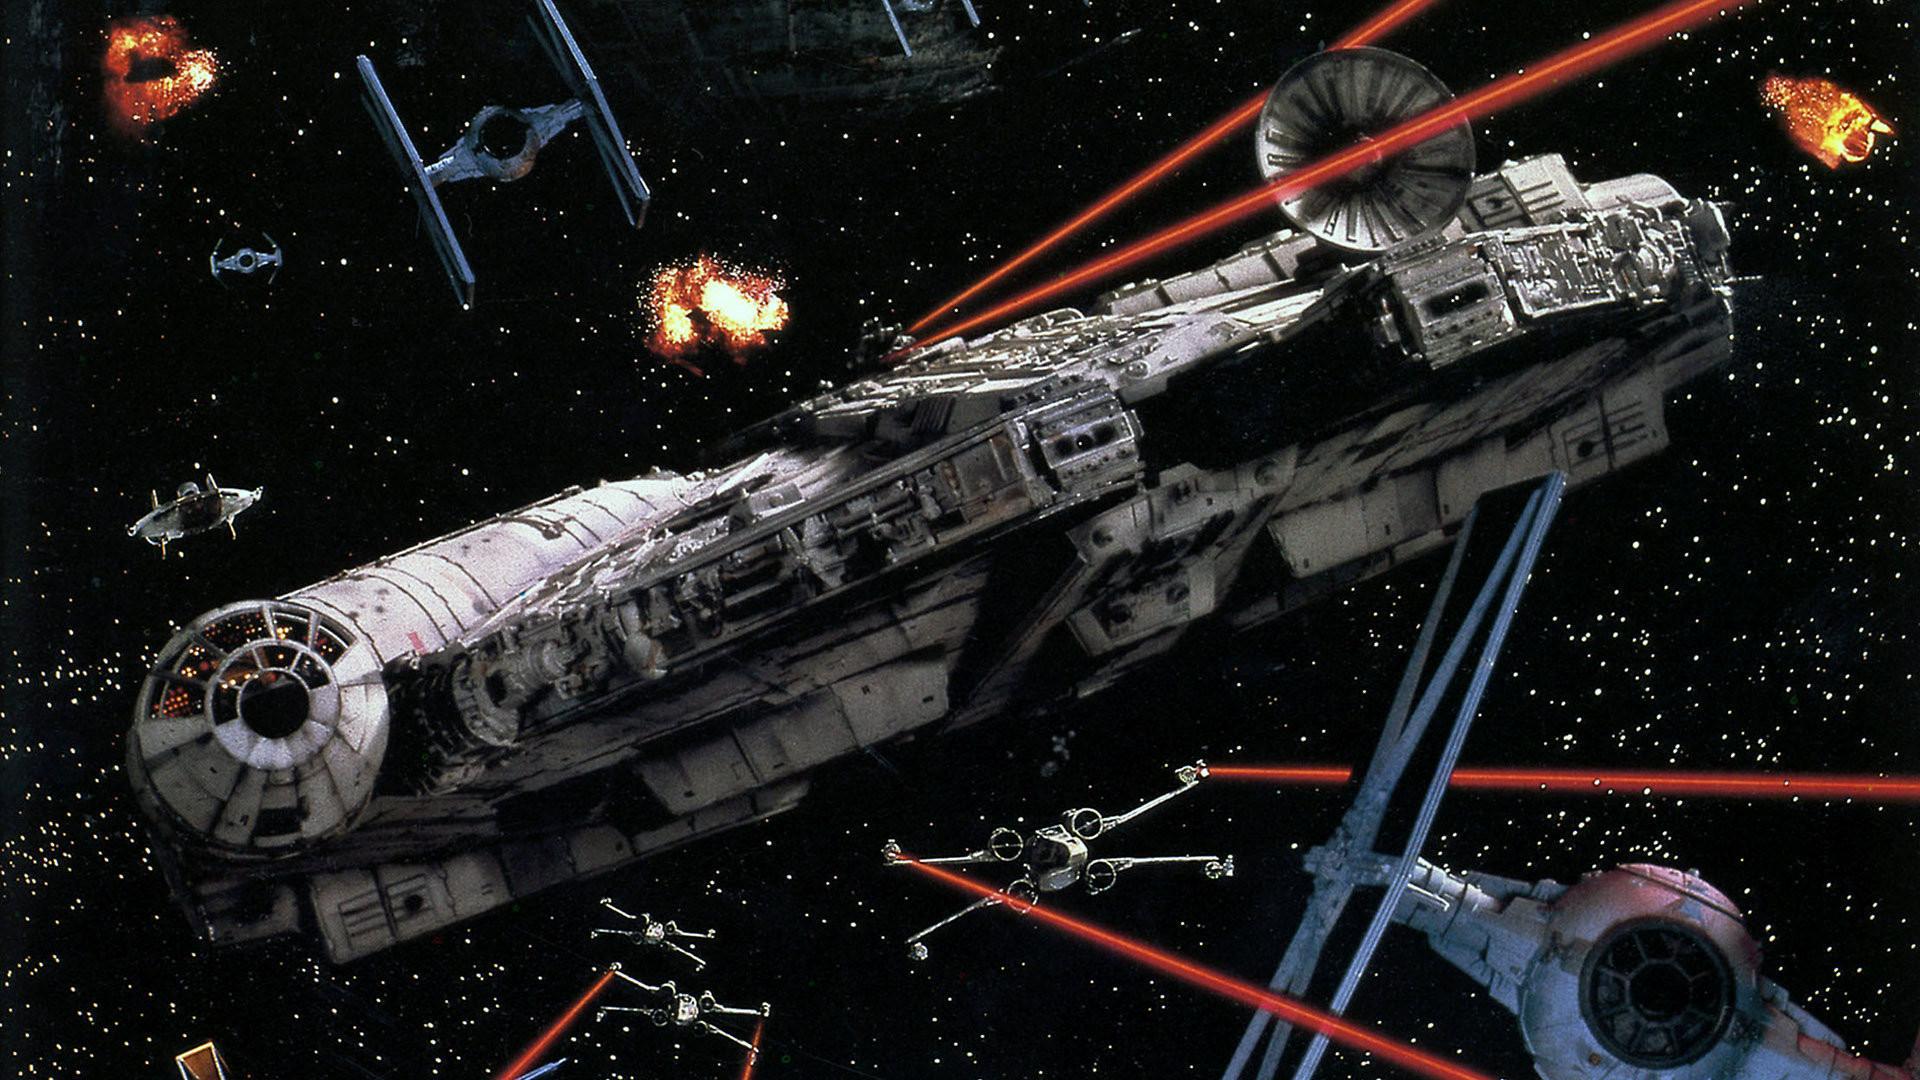 Epic Star Wars wallpaper!